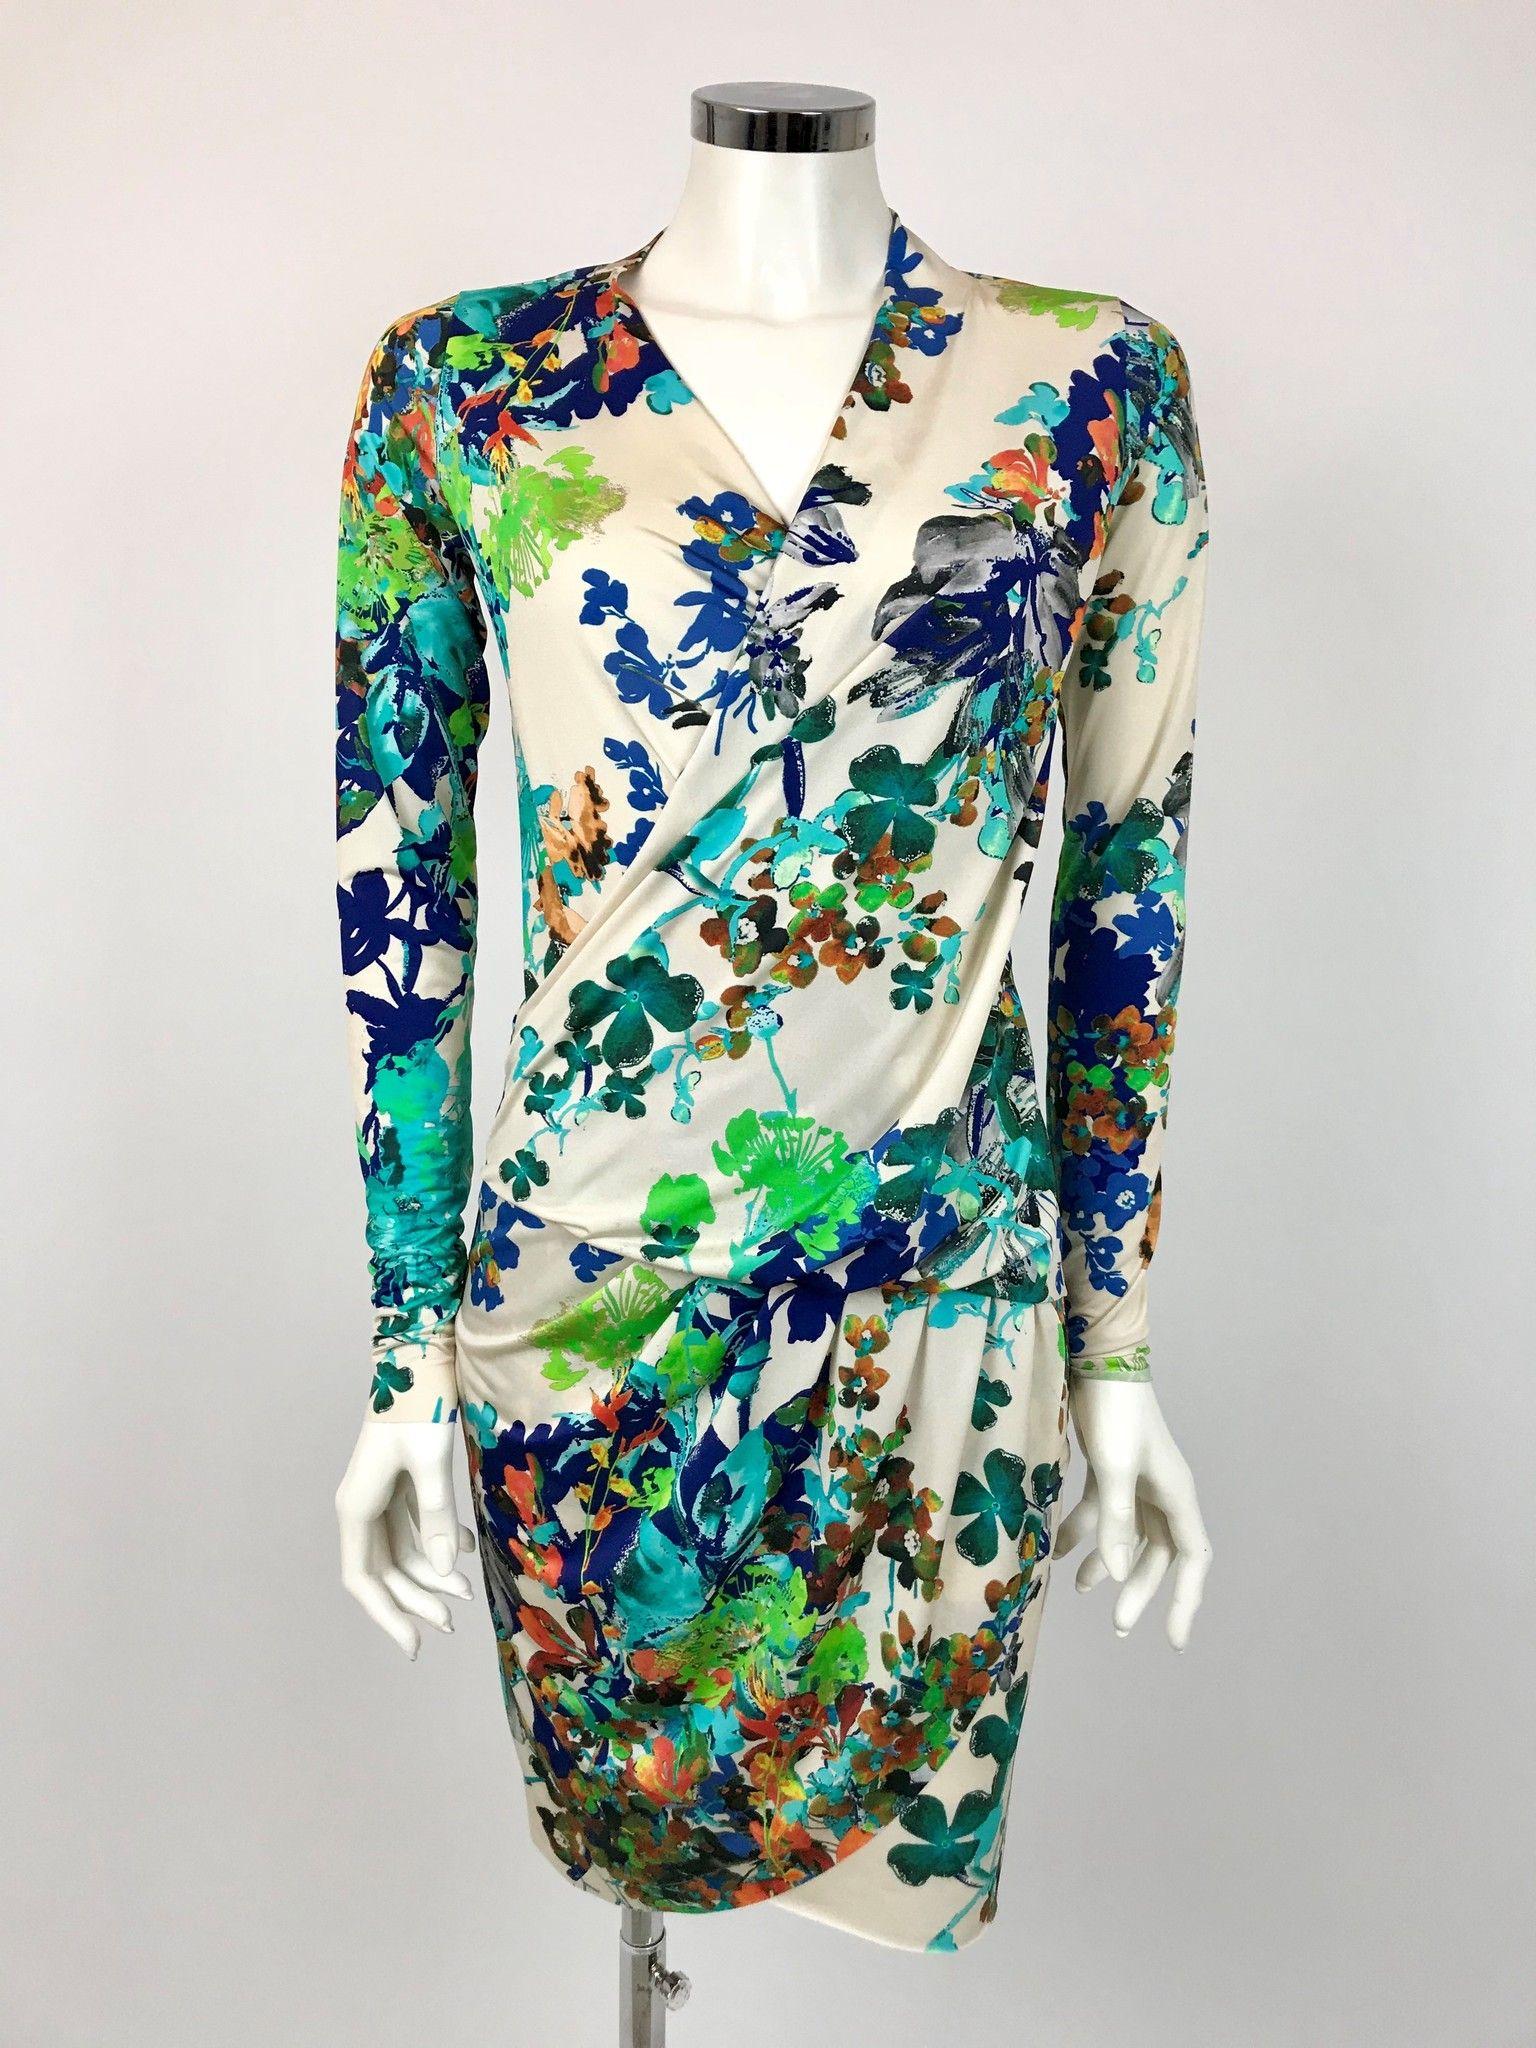 Adele Fado Fancy Dress with Drapes Cod.611820